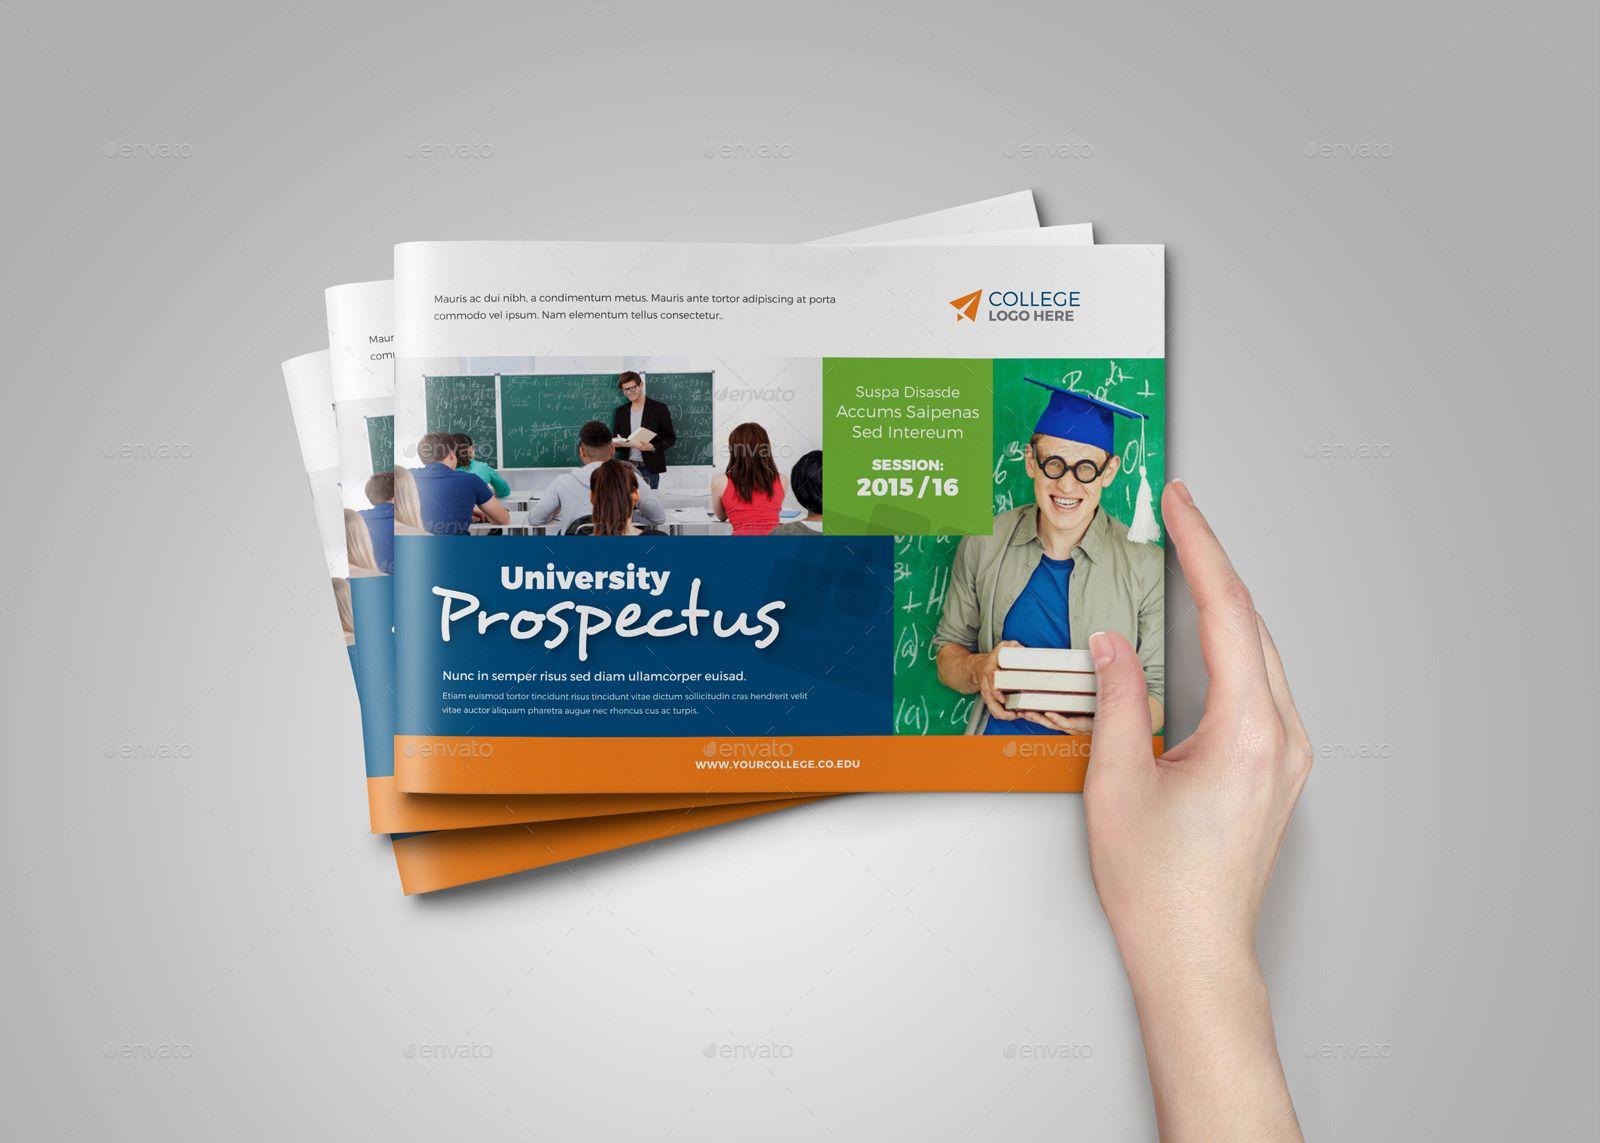 college university prospectus brochure v4  university   college   prospectus   brochure